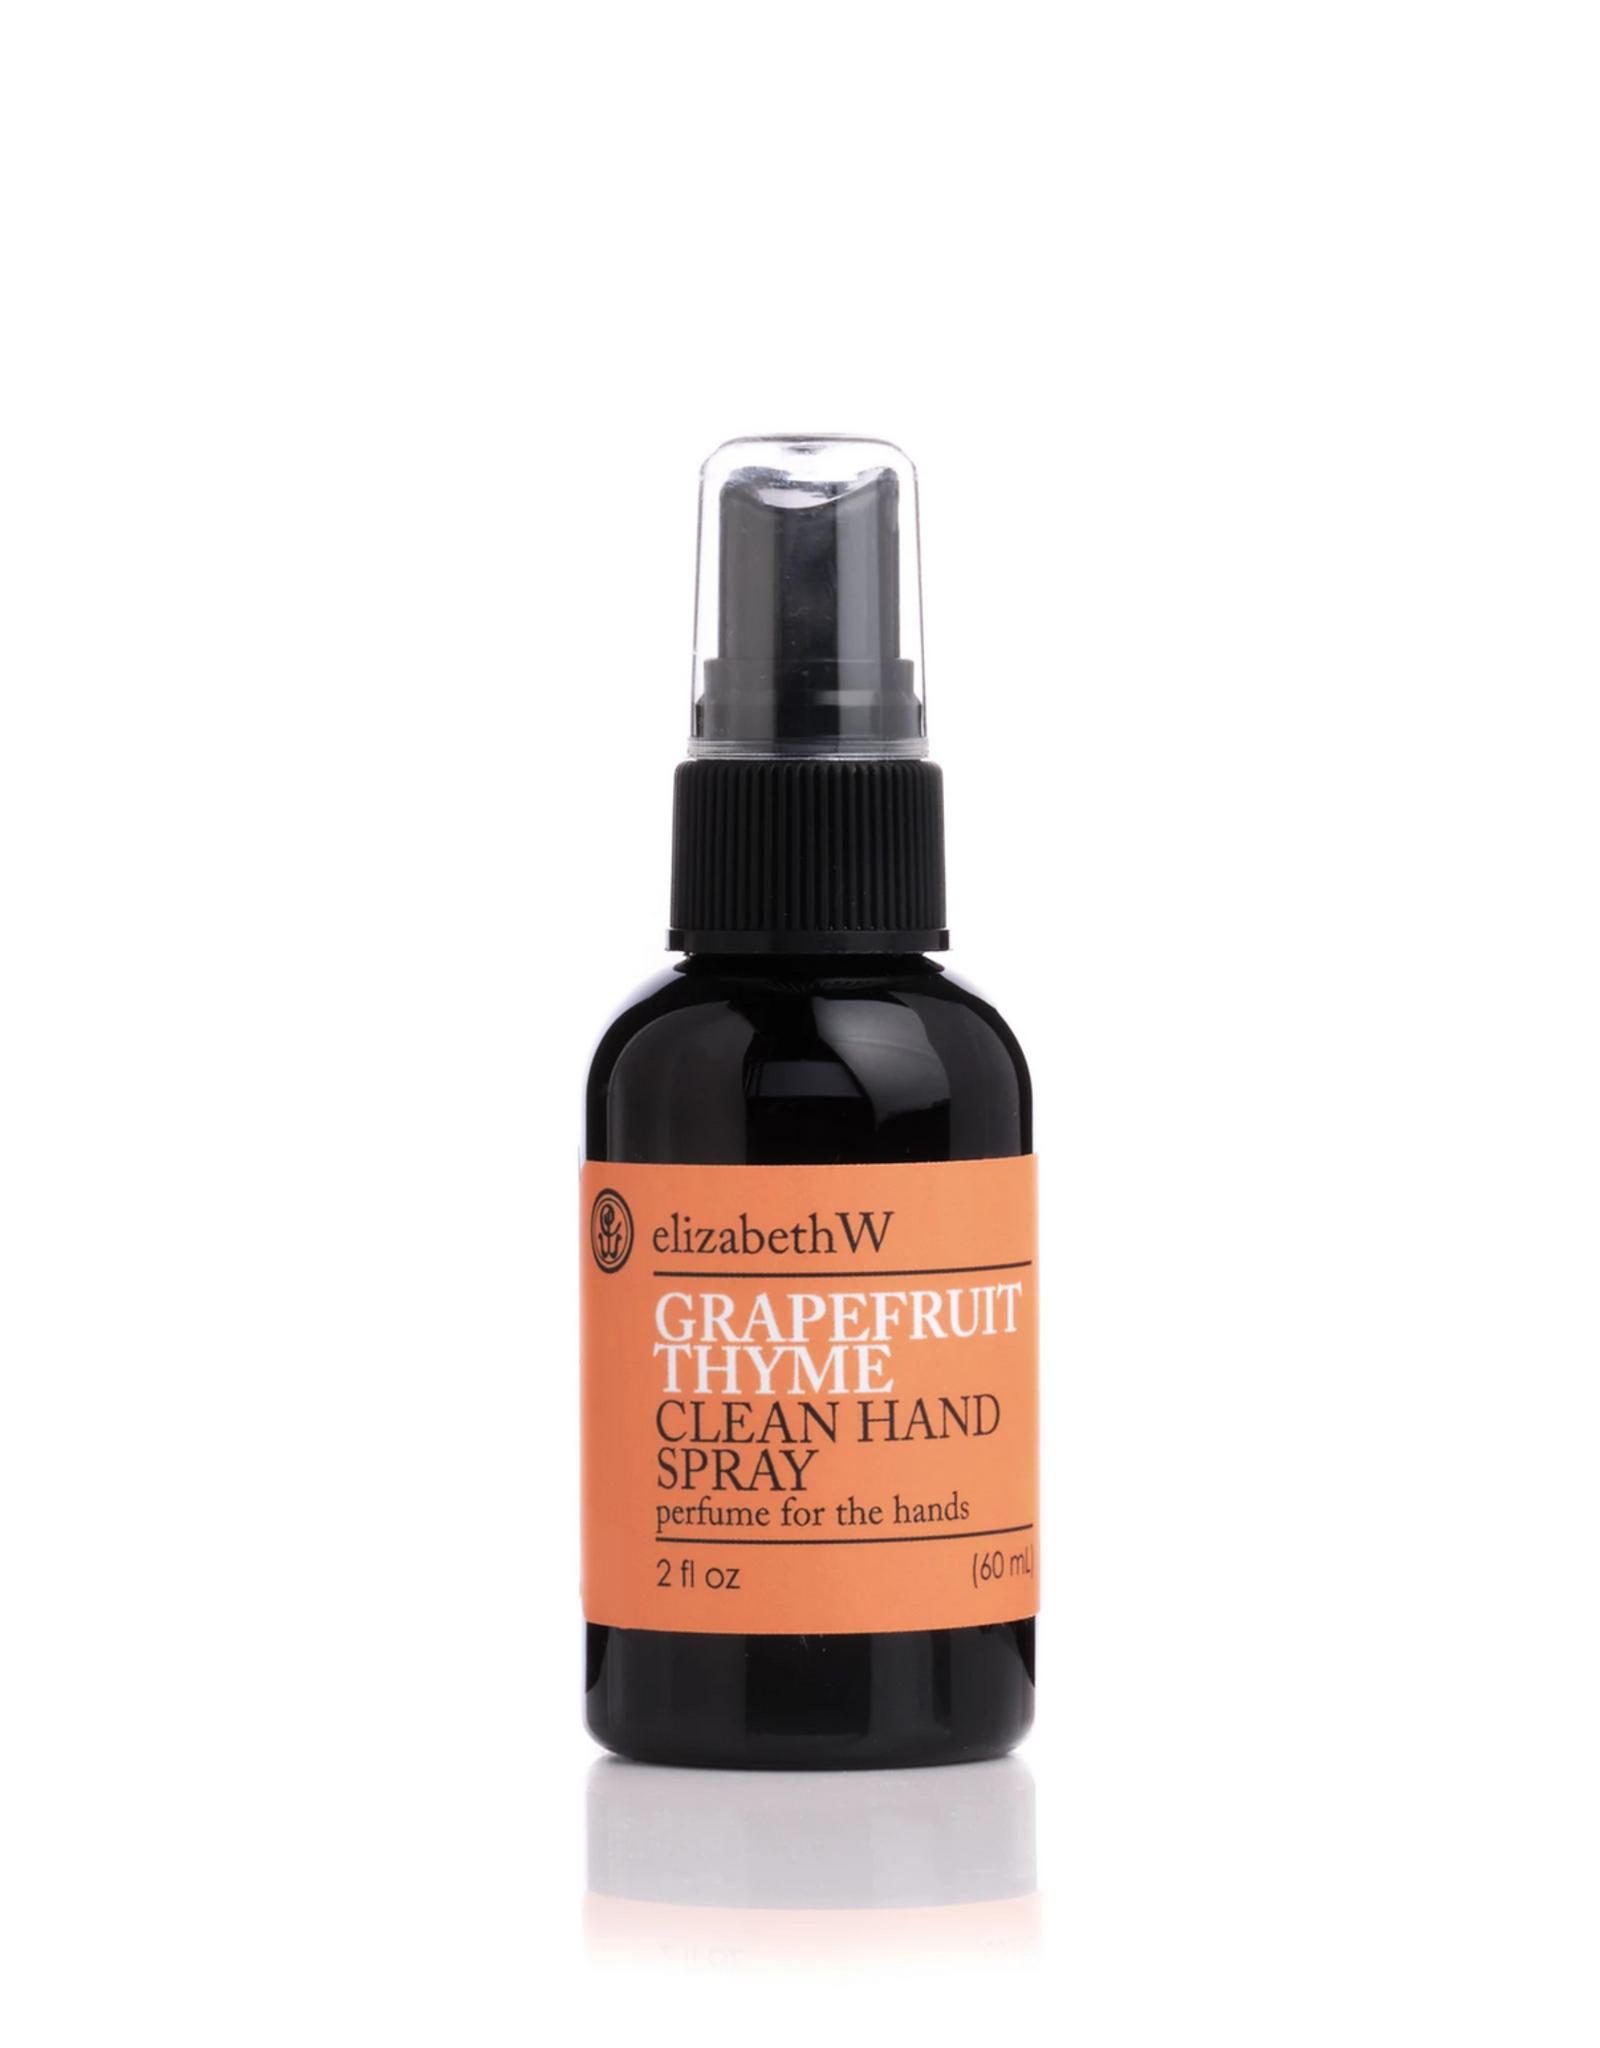 ELIZABETH W Grapefruit Thyme Hand Spray- 2 oz